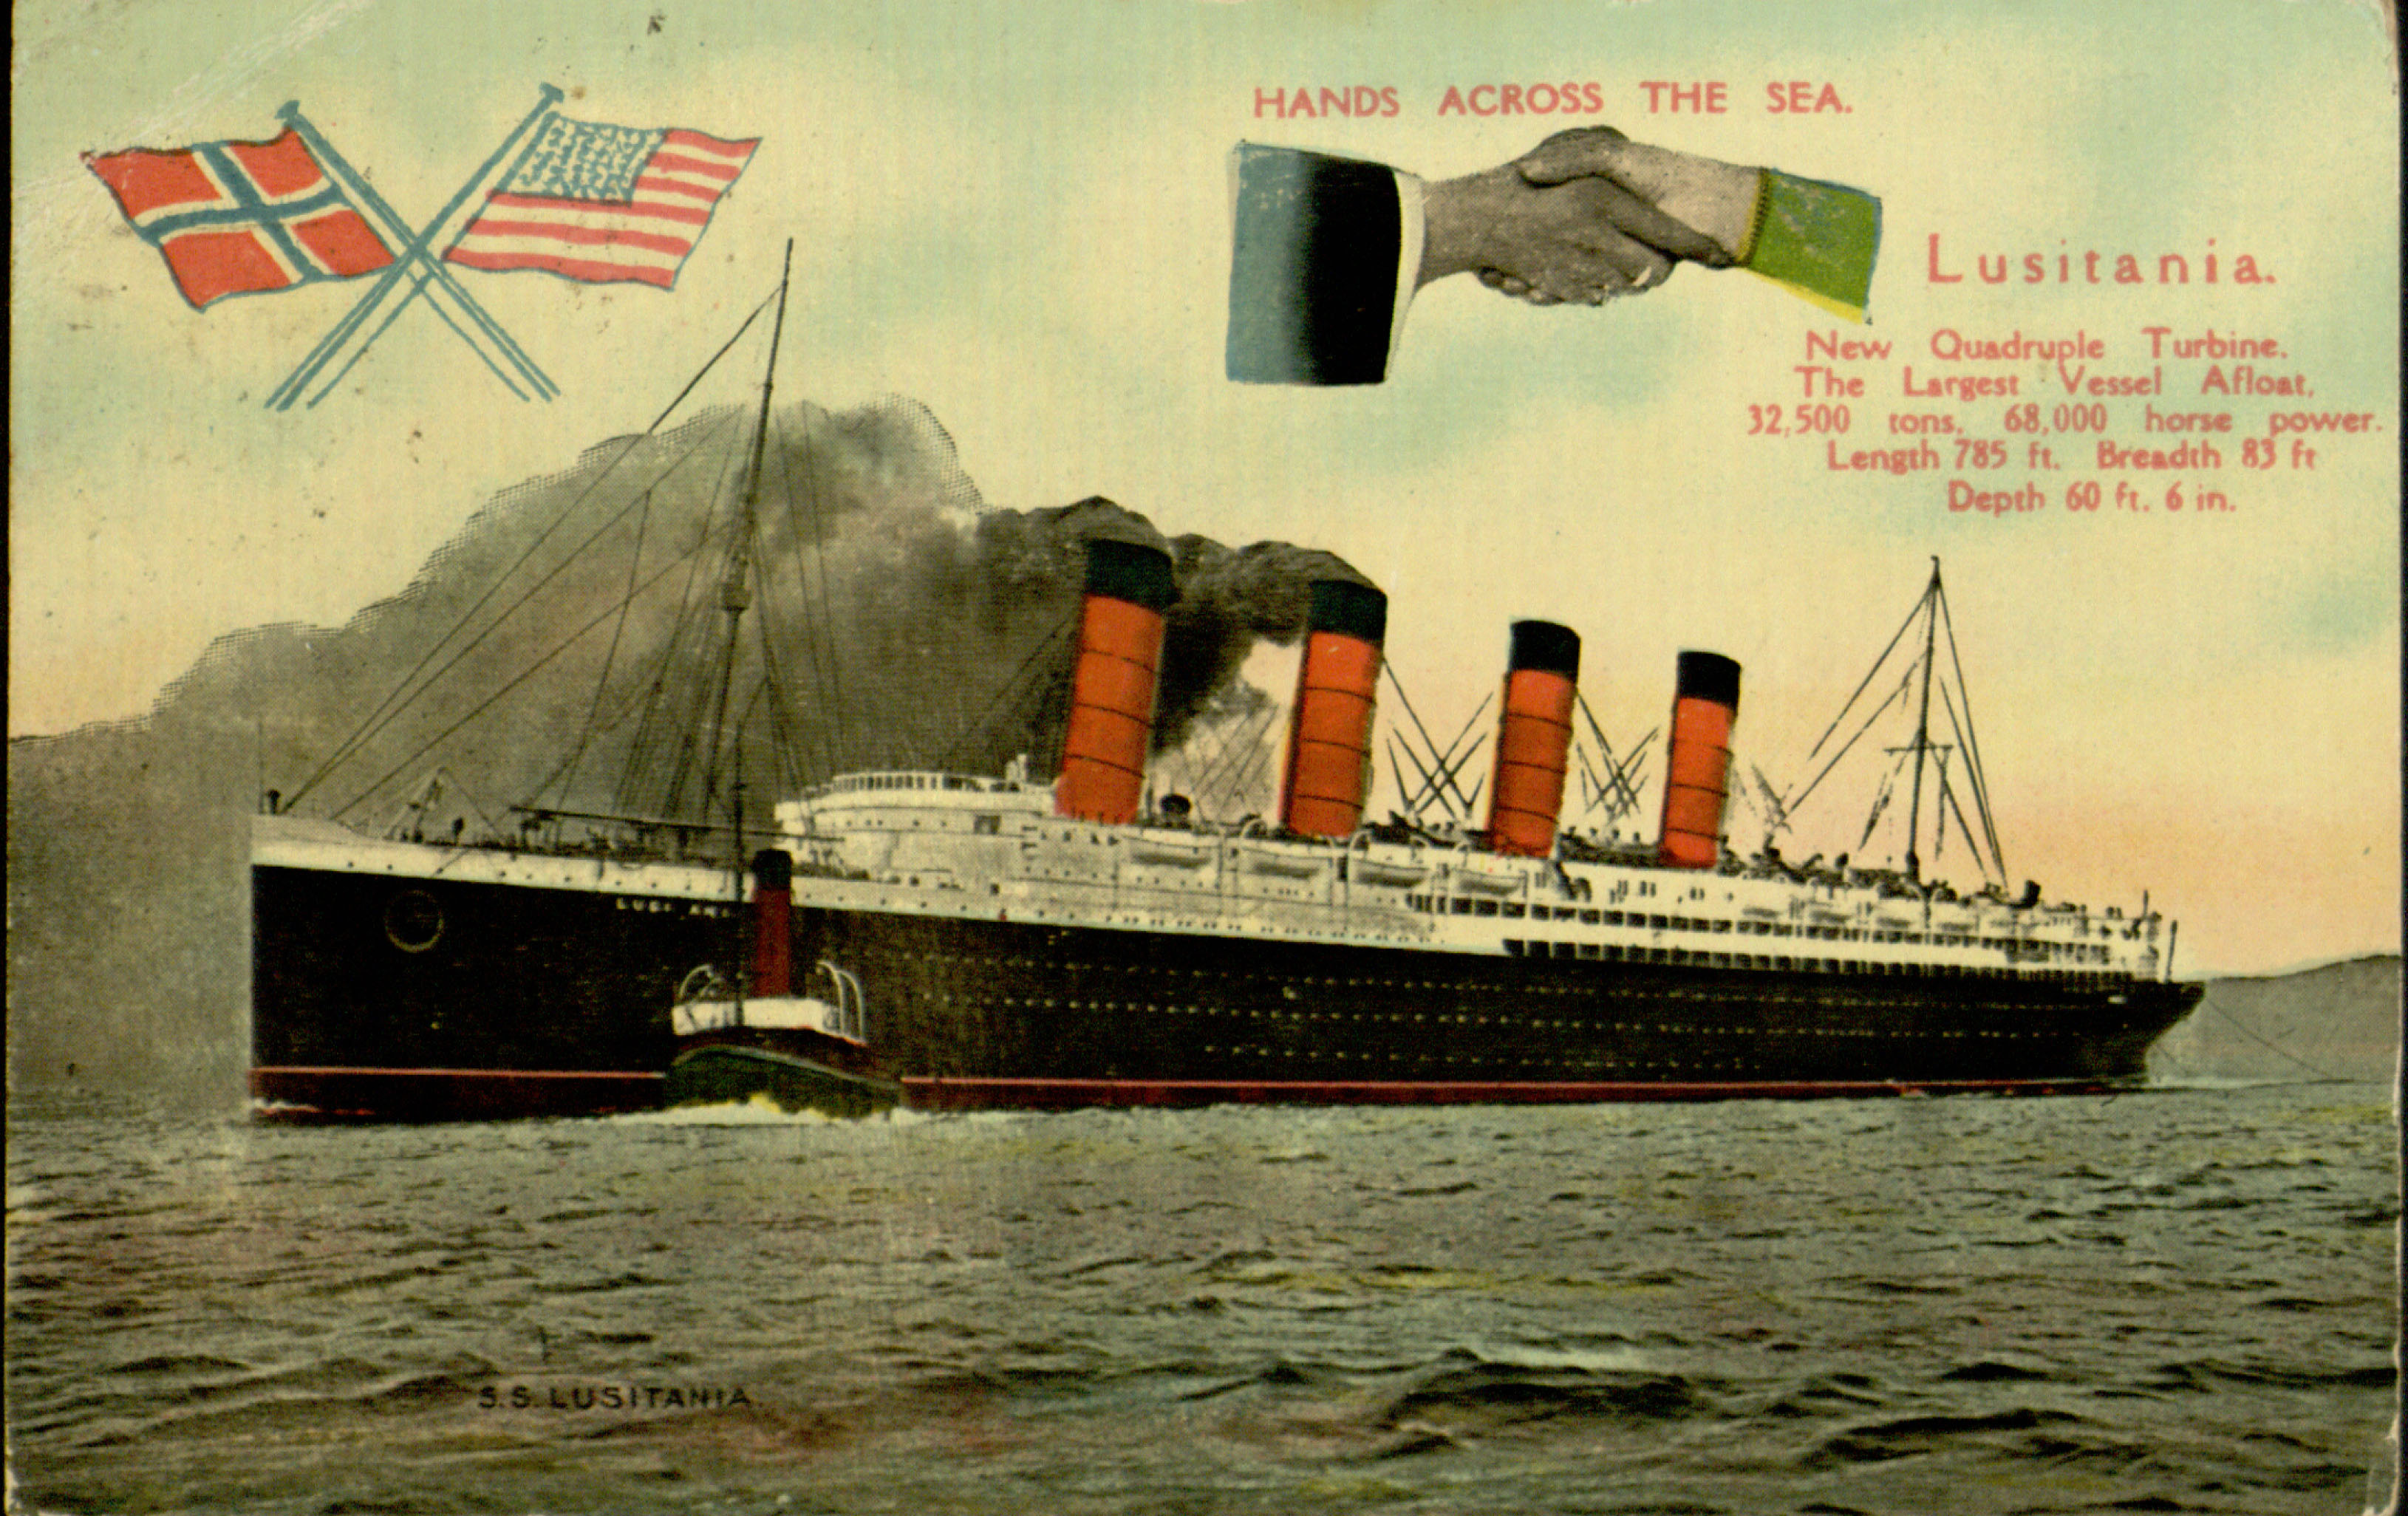 A postcard of the Lusitania